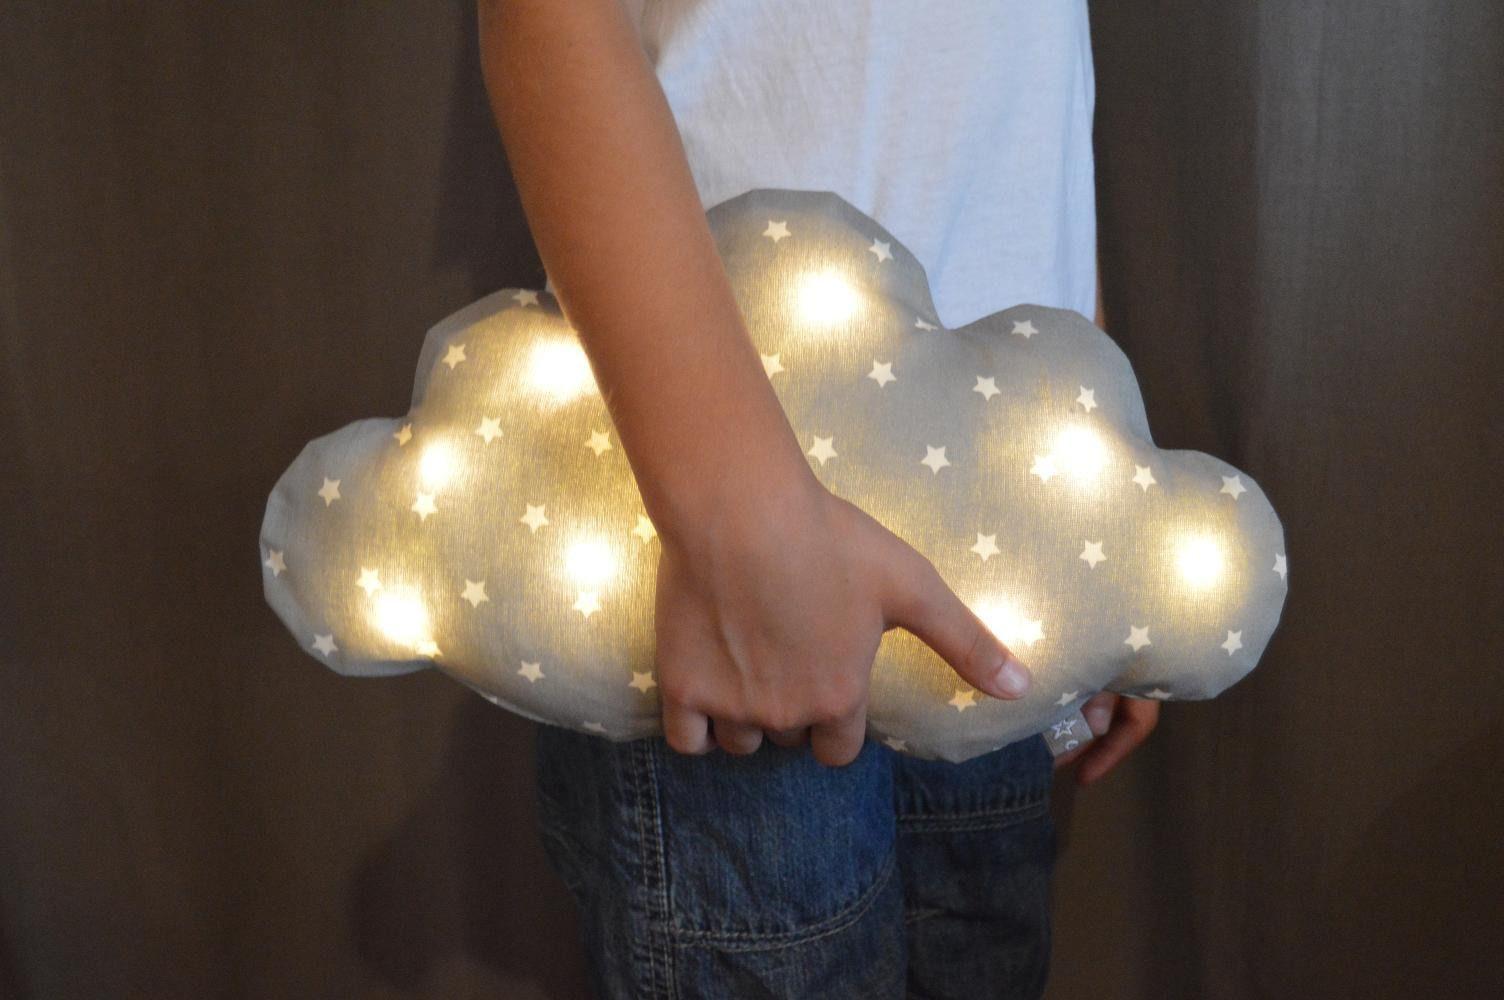 Coussin veilleuse b b enfants lampe nuage leds tissu - Lampe veilleuse bebe ...